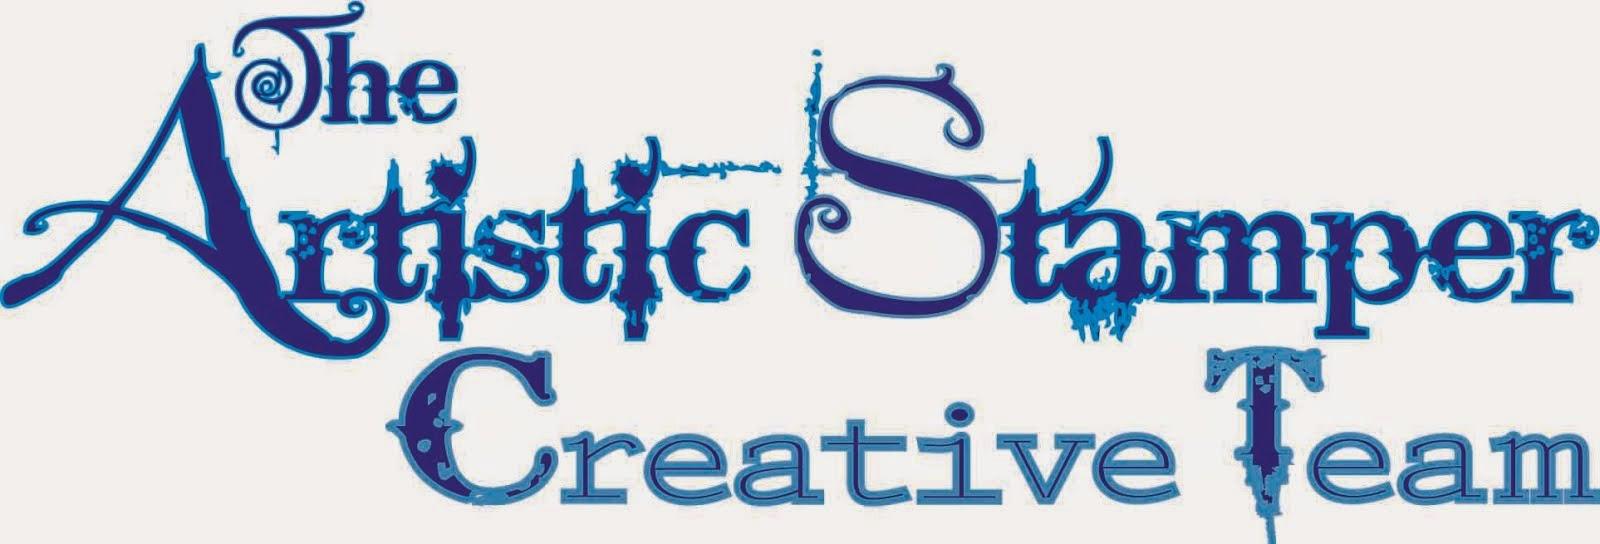 The Creative Team